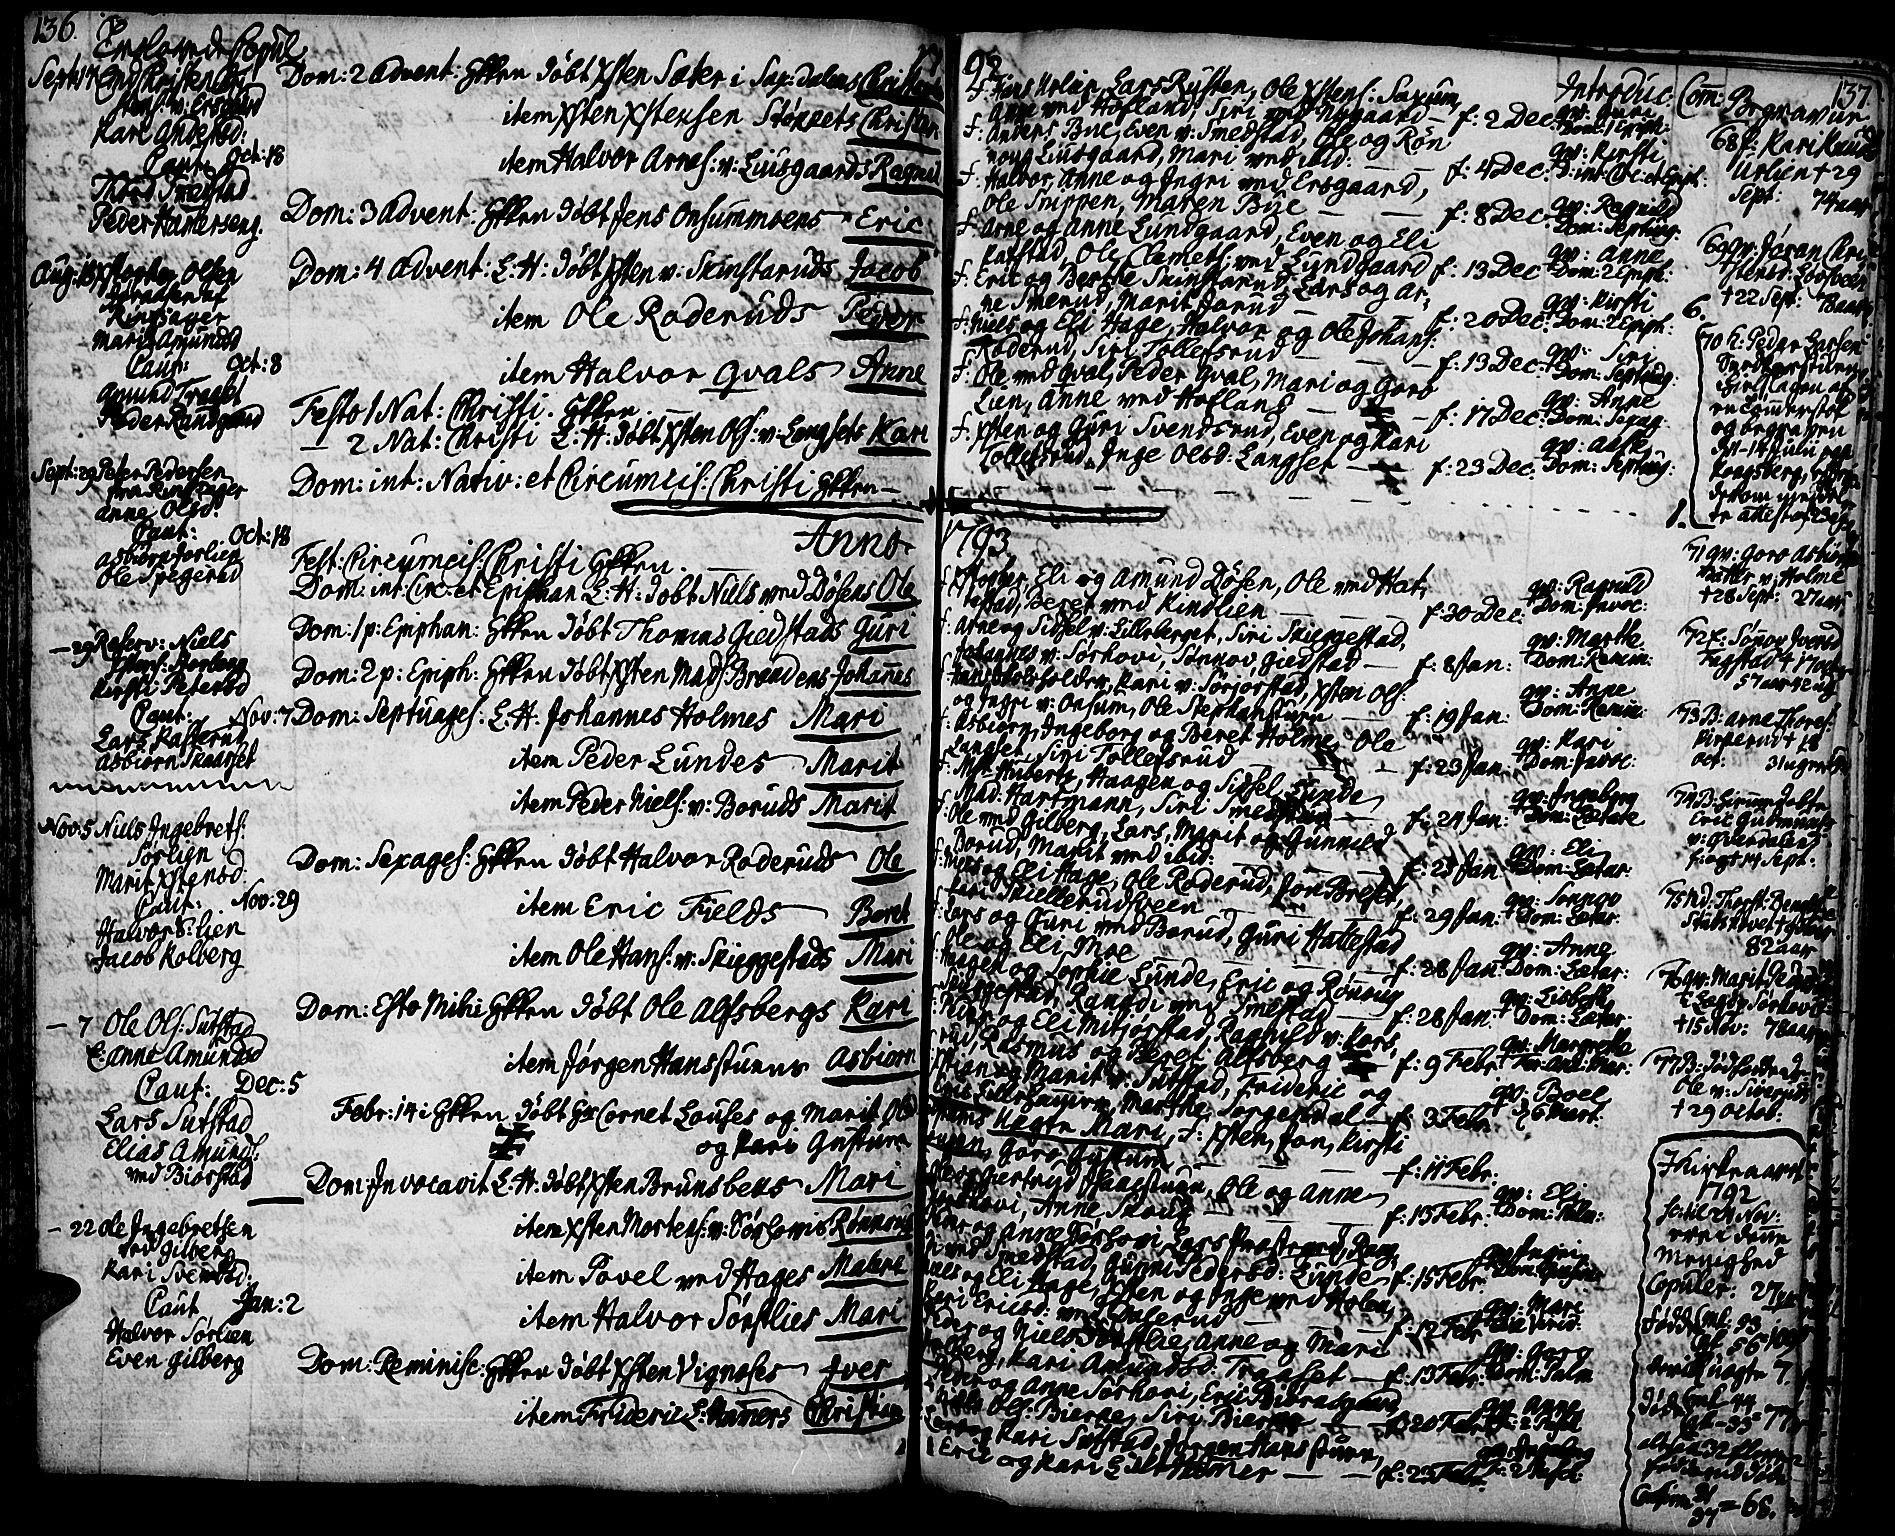 SAH, Fåberg prestekontor, Ministerialbok nr. 2, 1775-1818, s. 136-137